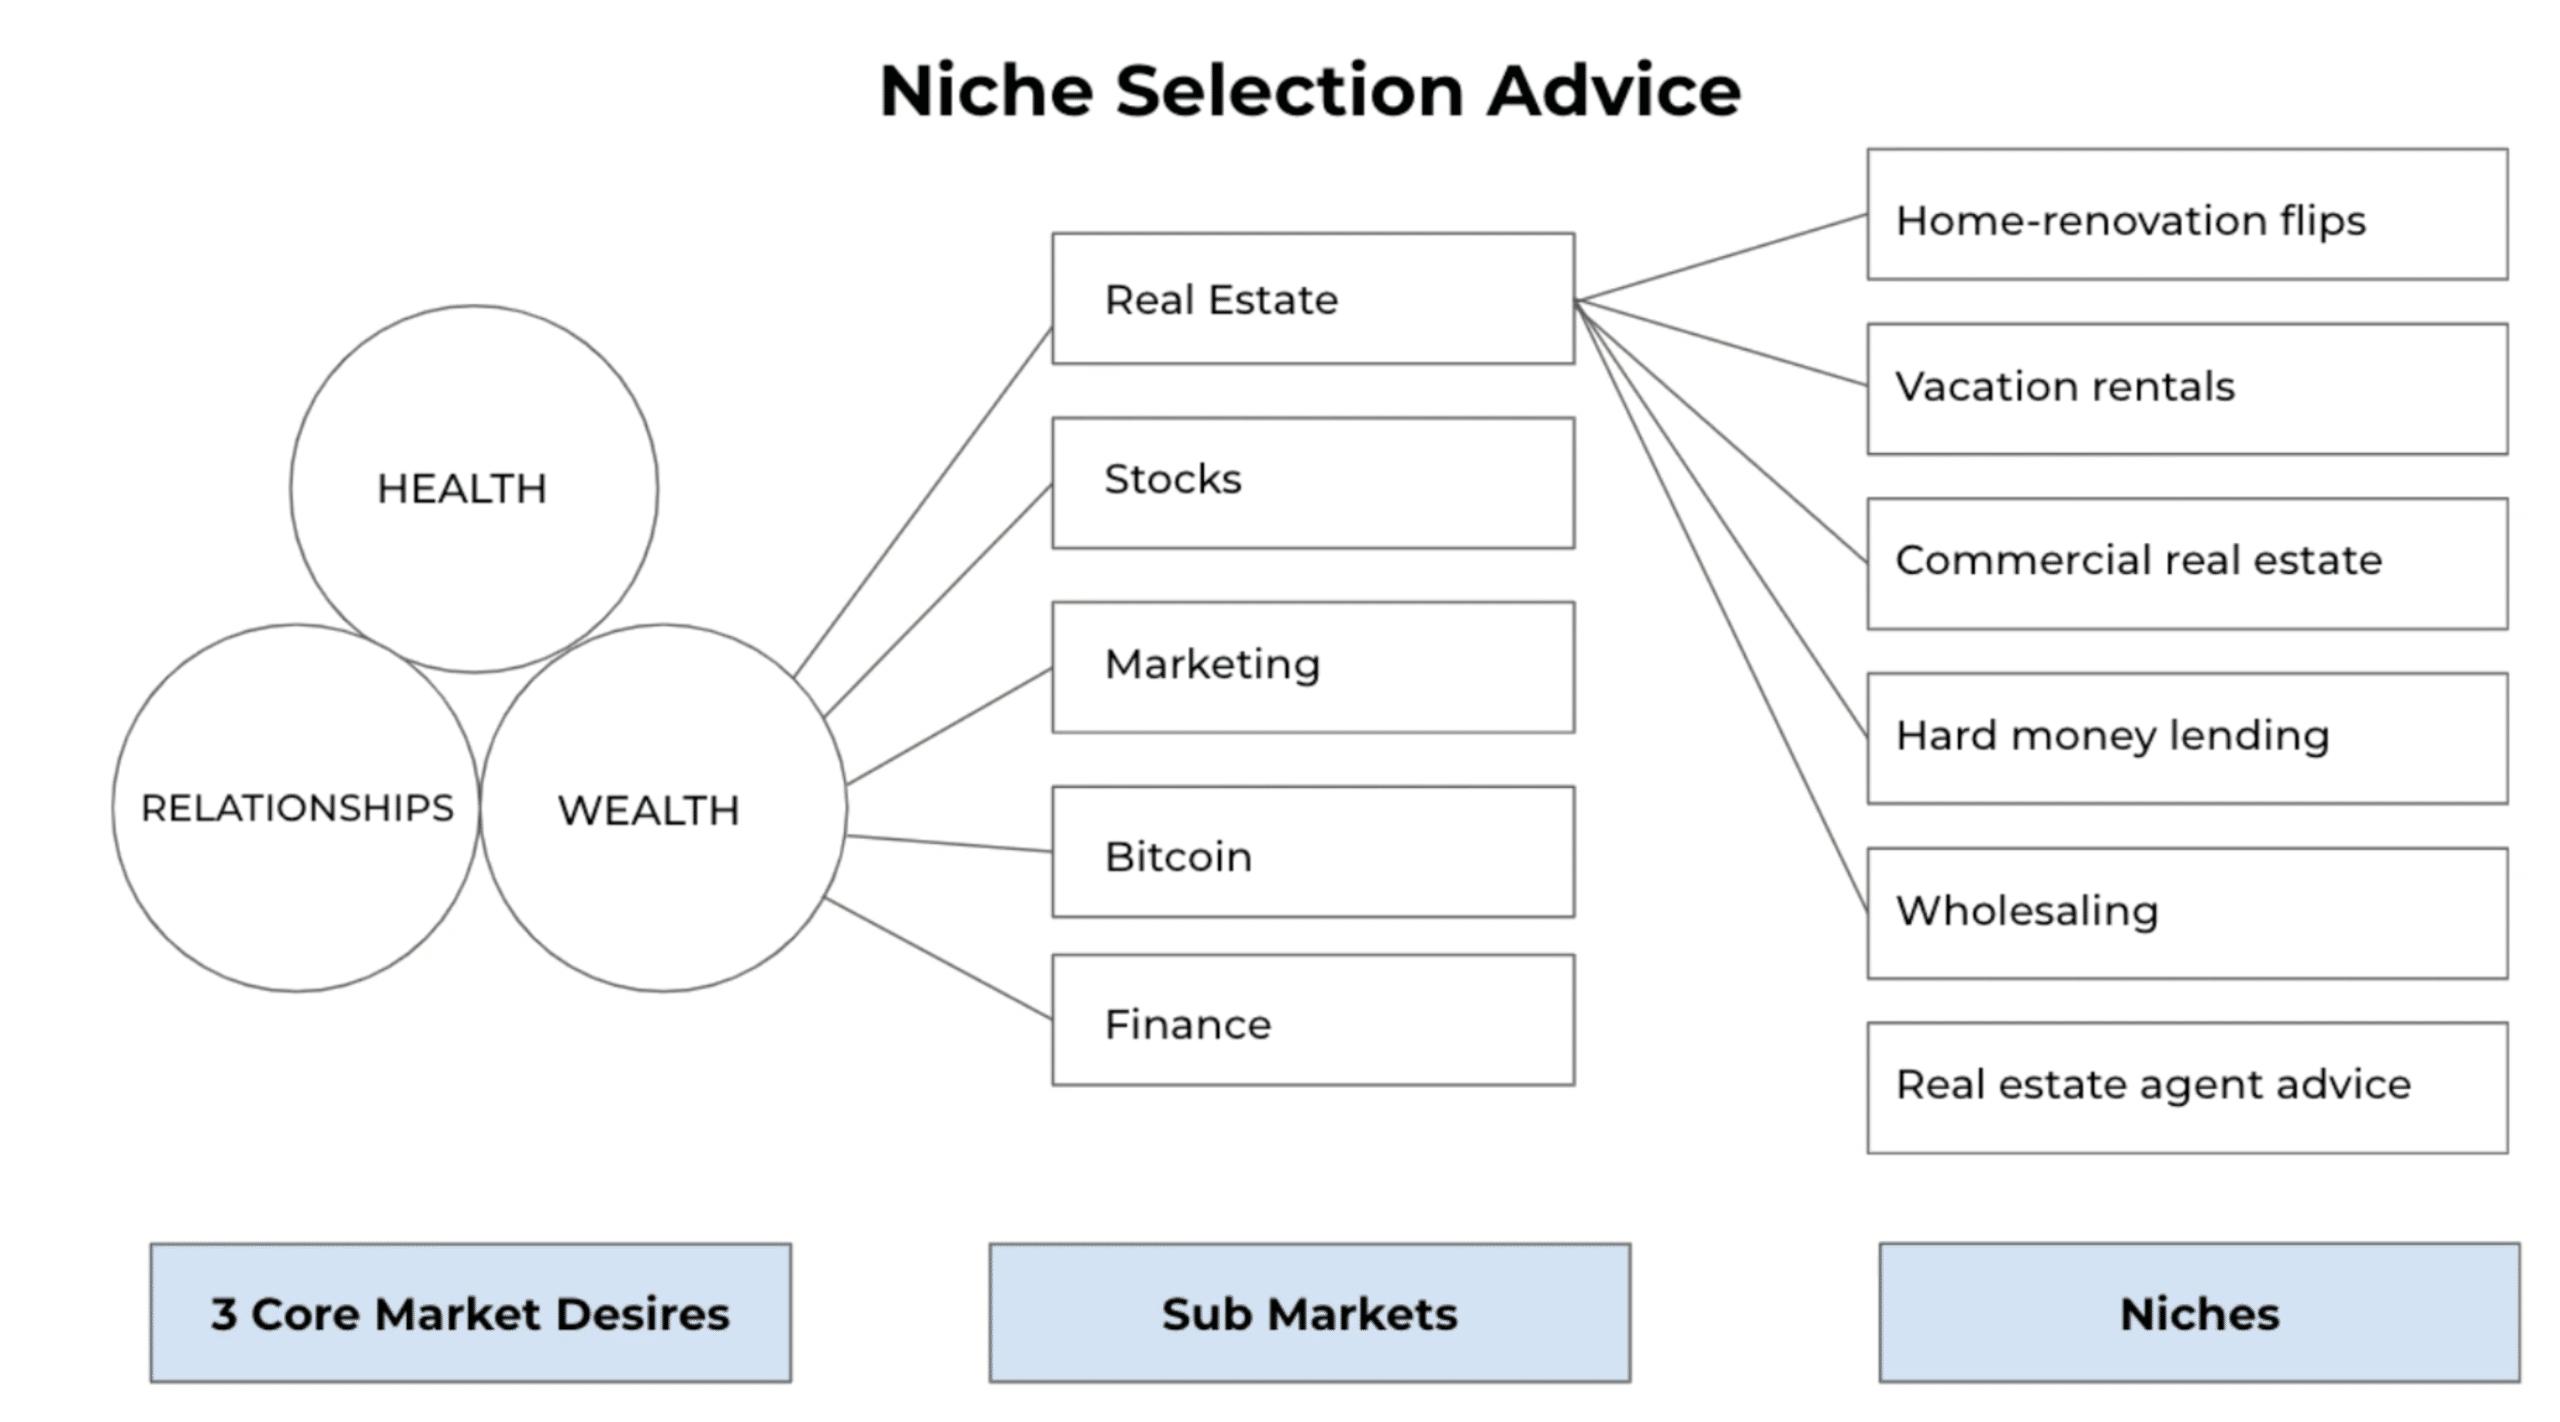 Category Niche